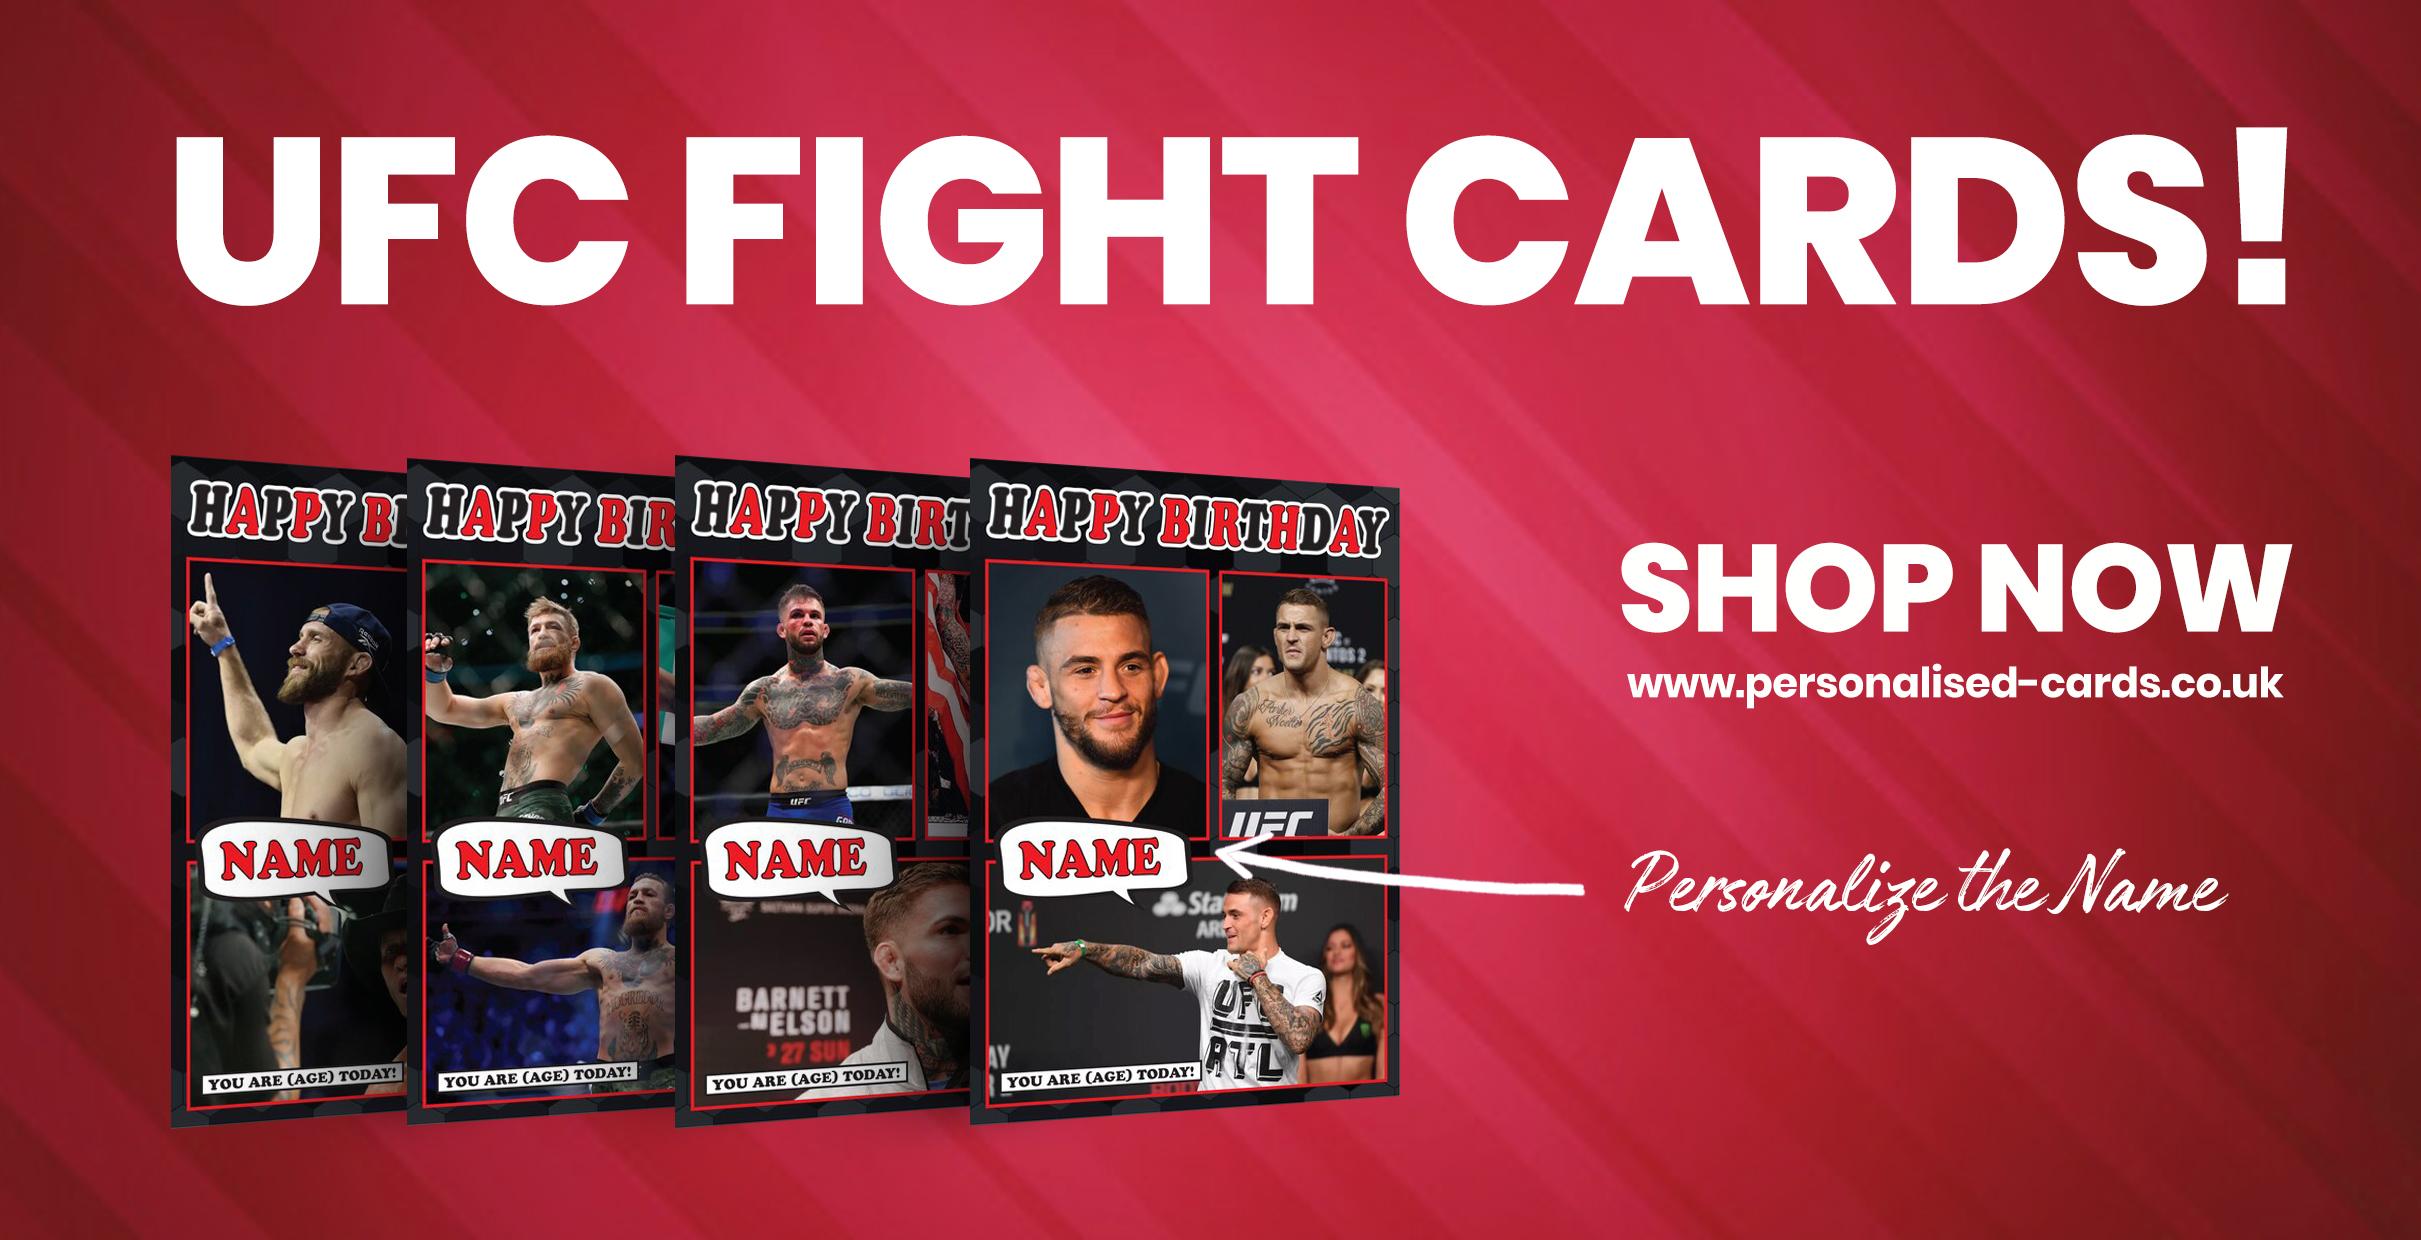 ufc-fight-cards.jpg